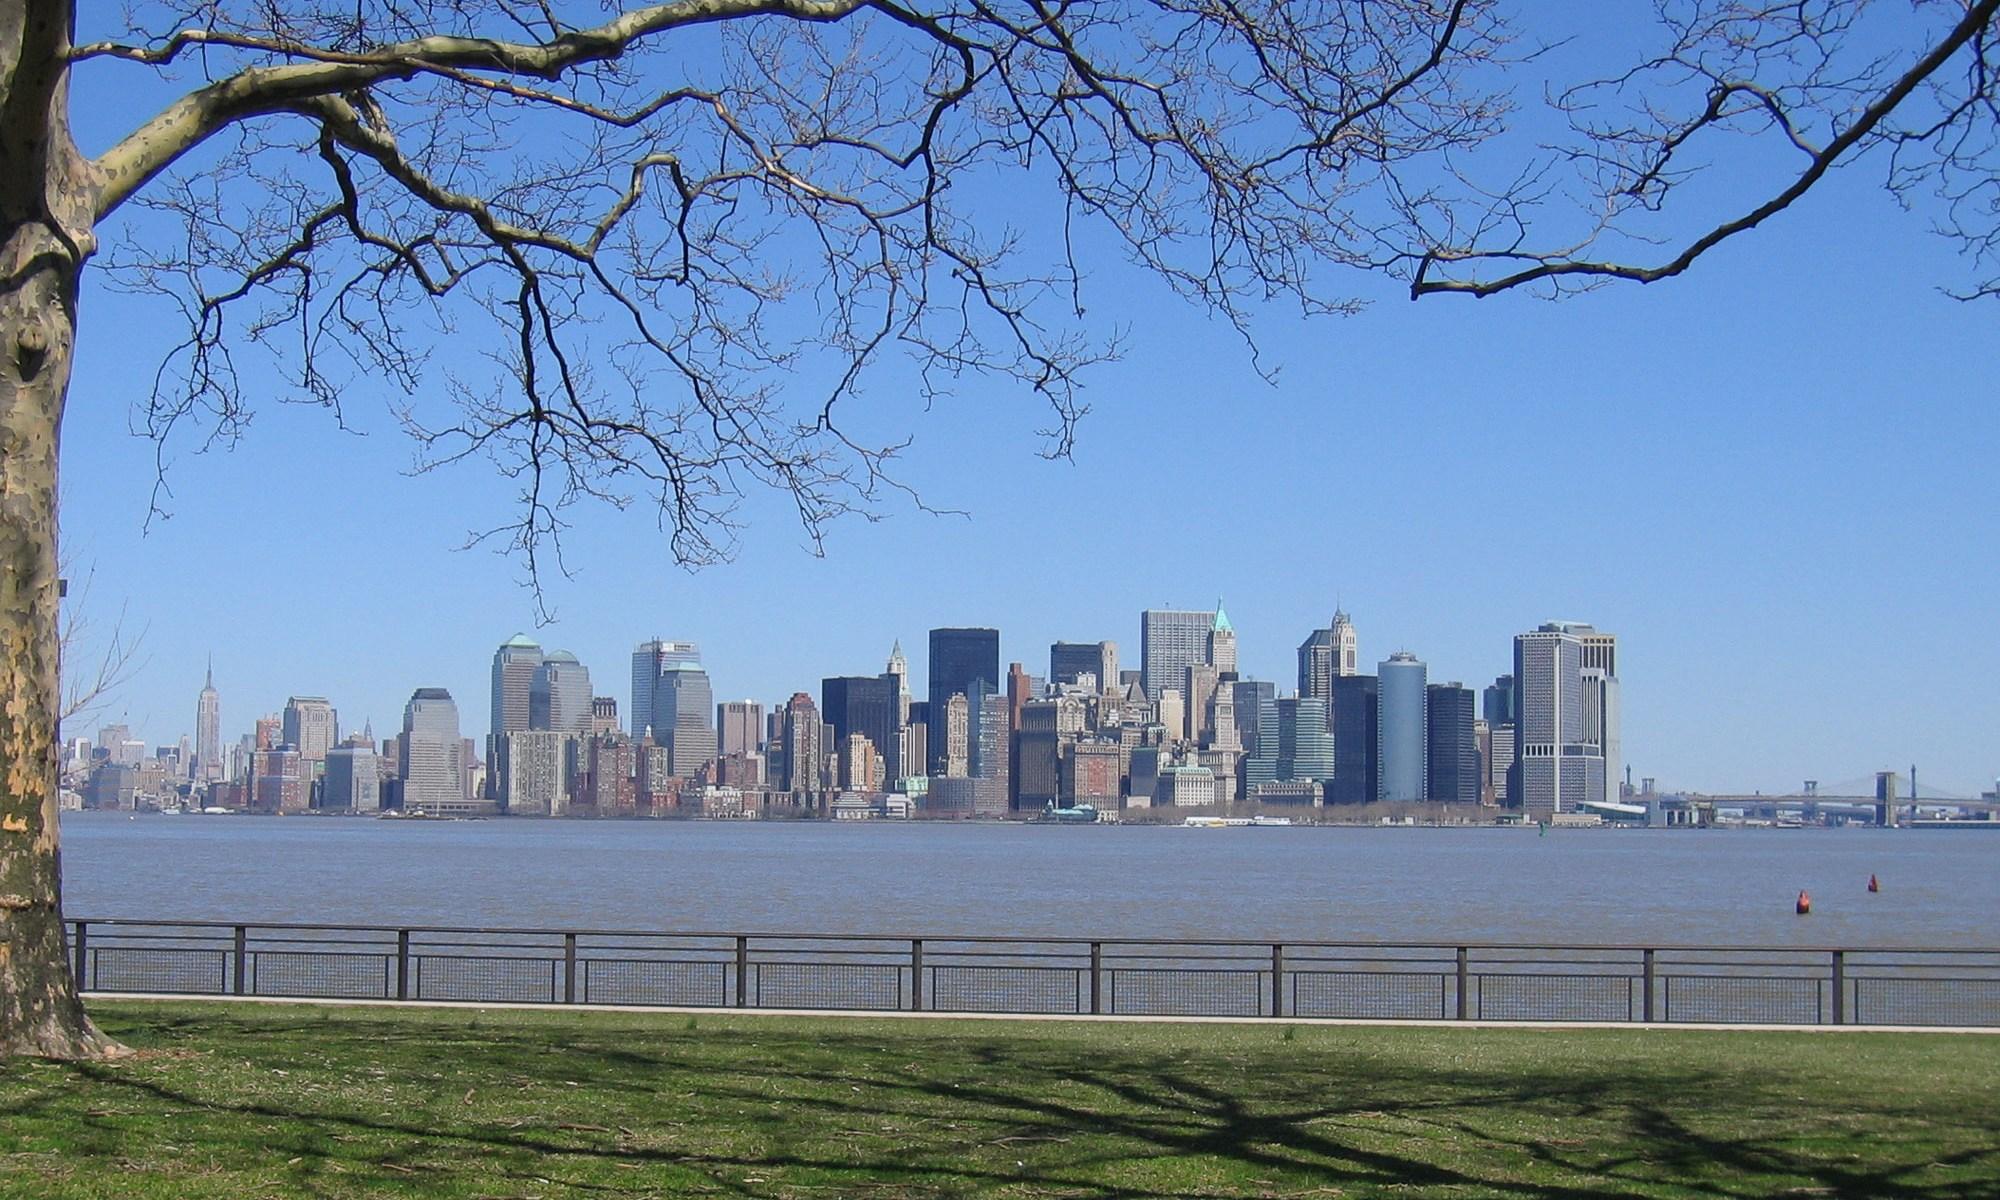 New York City skyline from Liberty Island